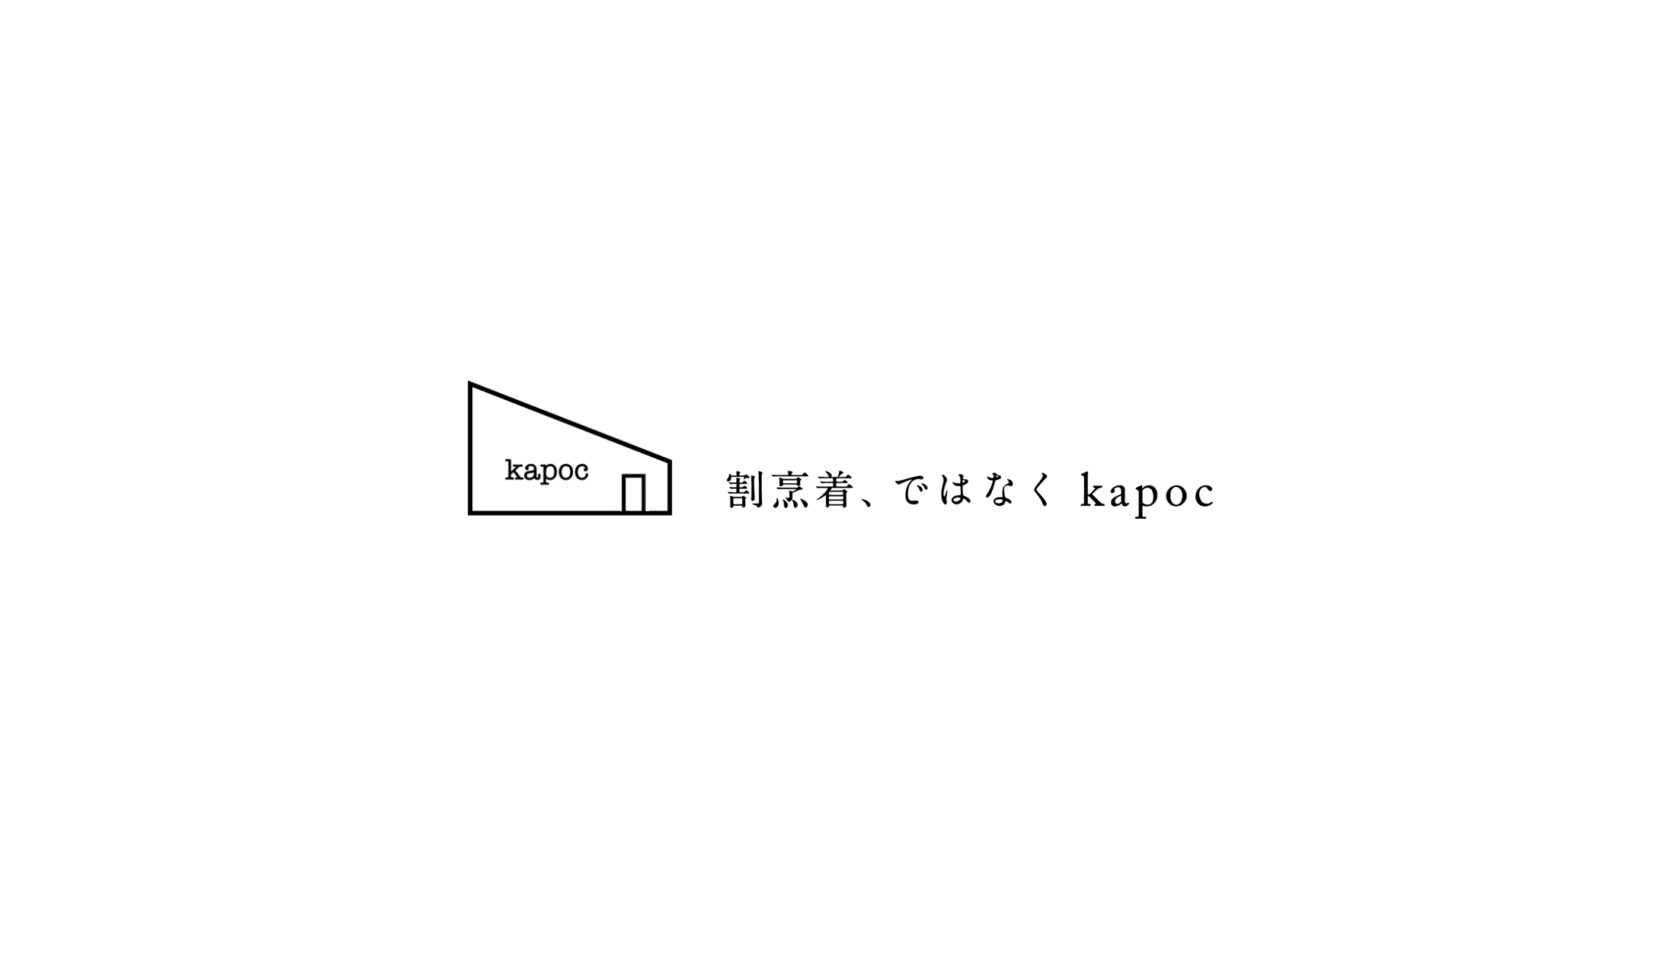 kapocオンラインサイトの楽しみ方